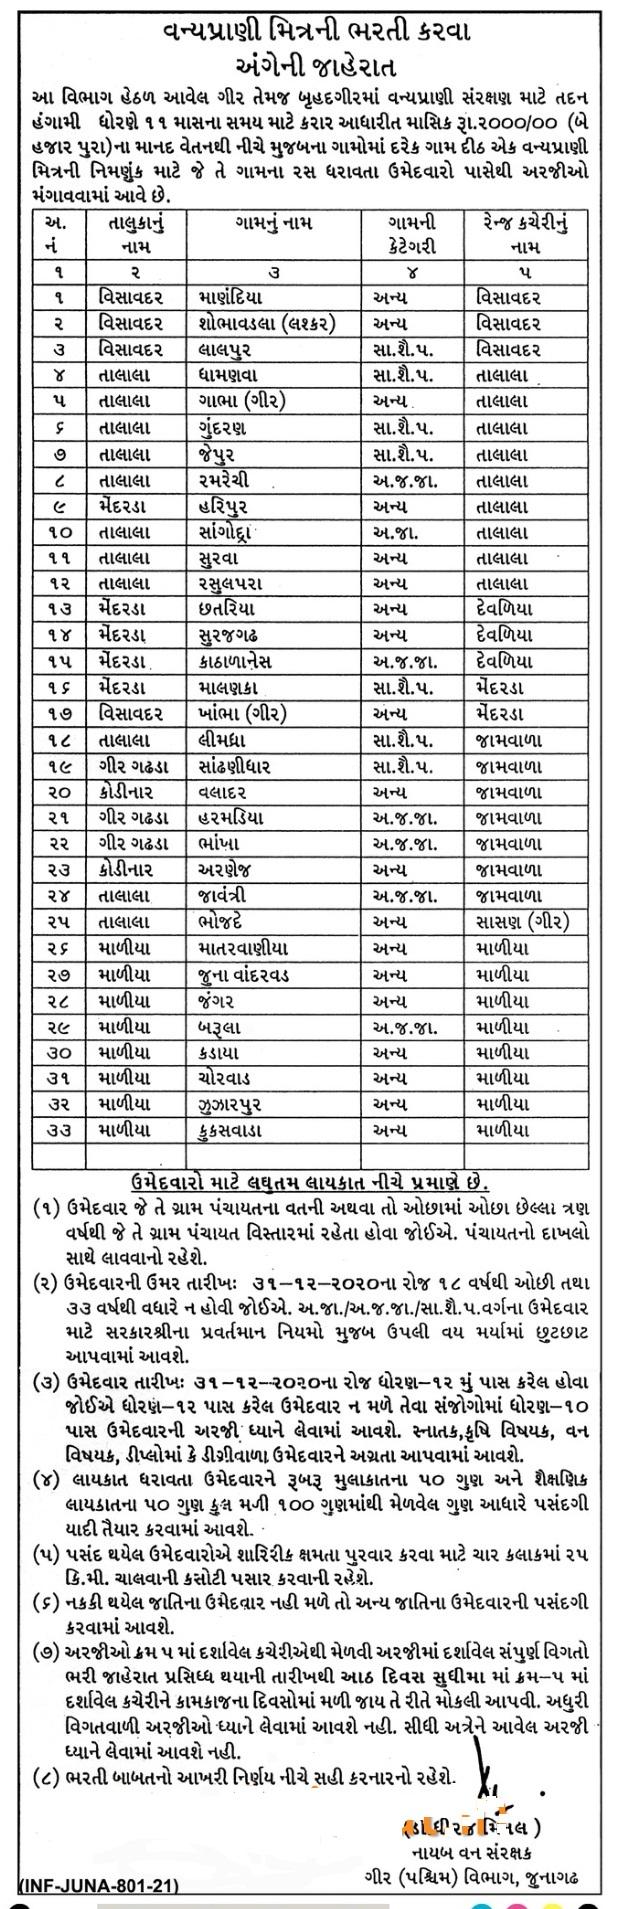 Gir/BruhadGir Forest Department Recruitment 2021 ( 33 vanyaprani Mitra Posts)